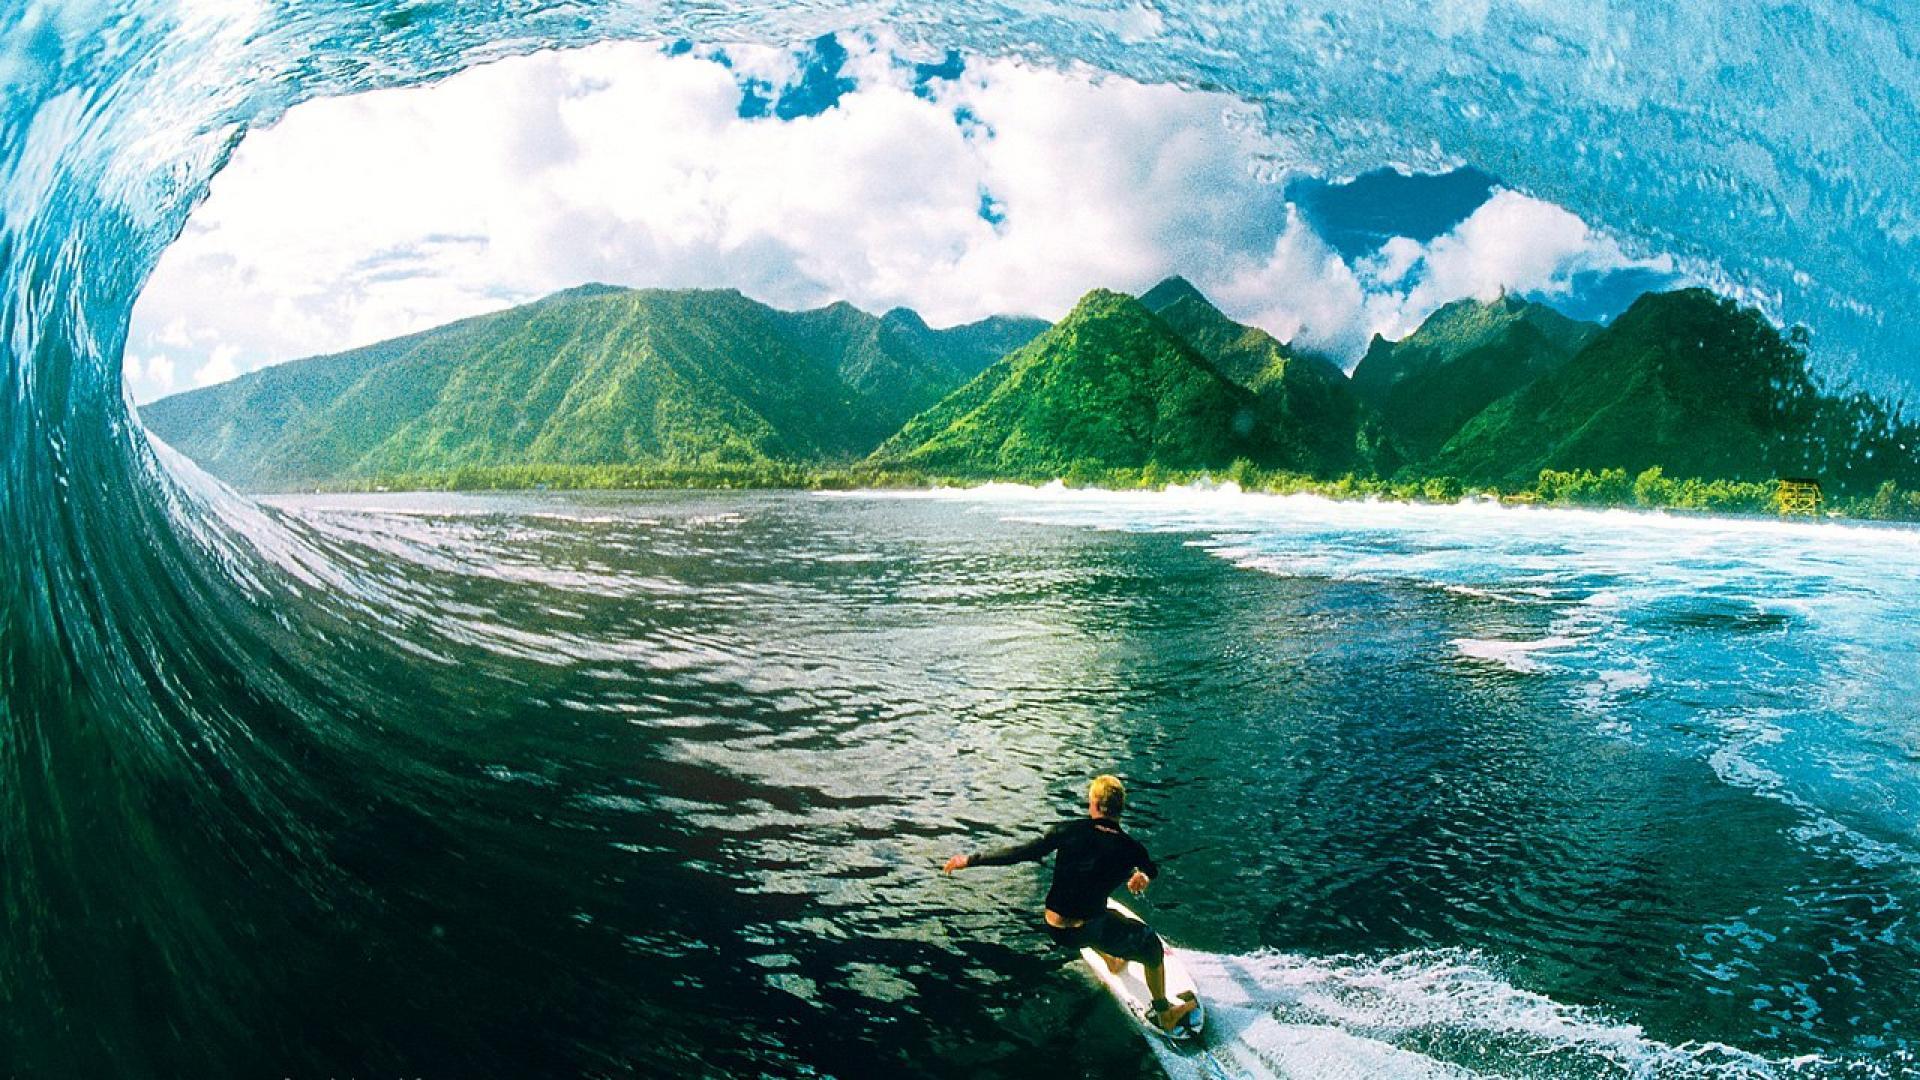 surfing wallpaper 1920x1080 wallpapersafari